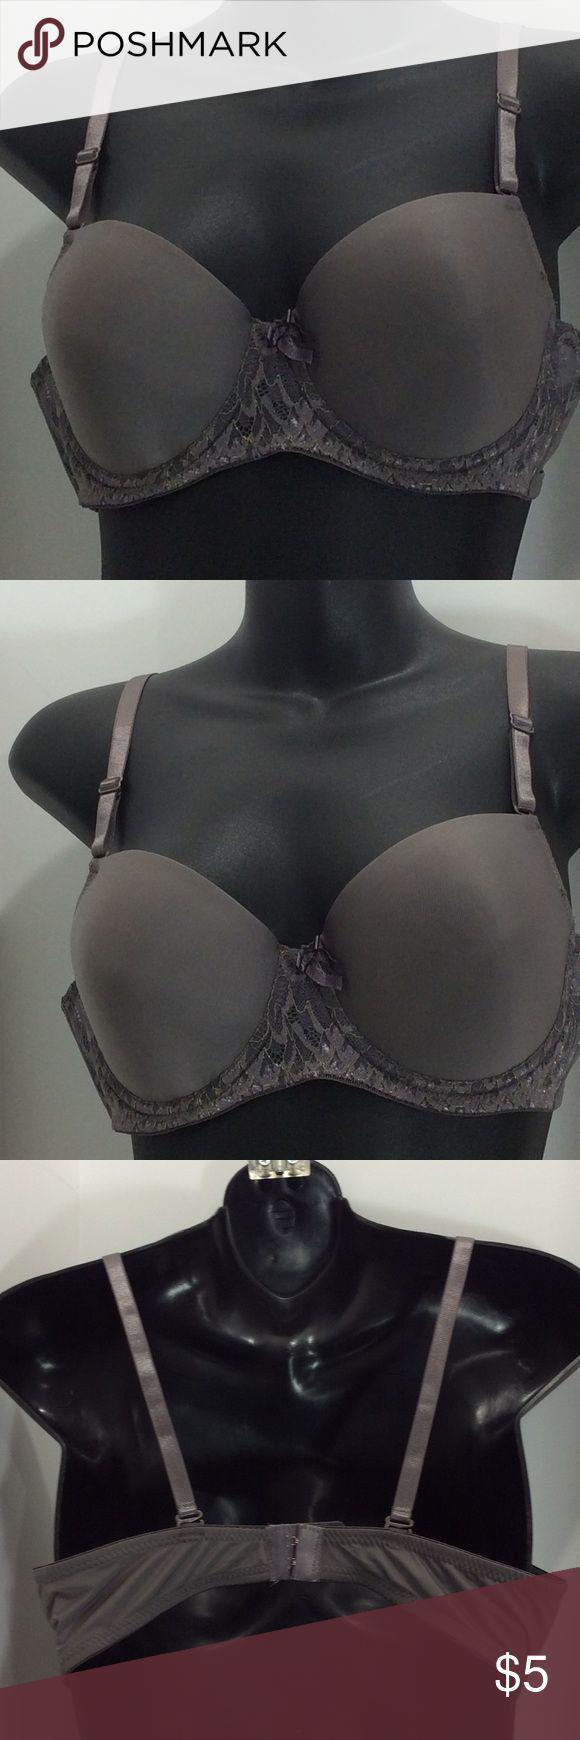 Ladies bra size 38C Ladies vras size 38C new without tags. Intimates & Sleepwear Bras